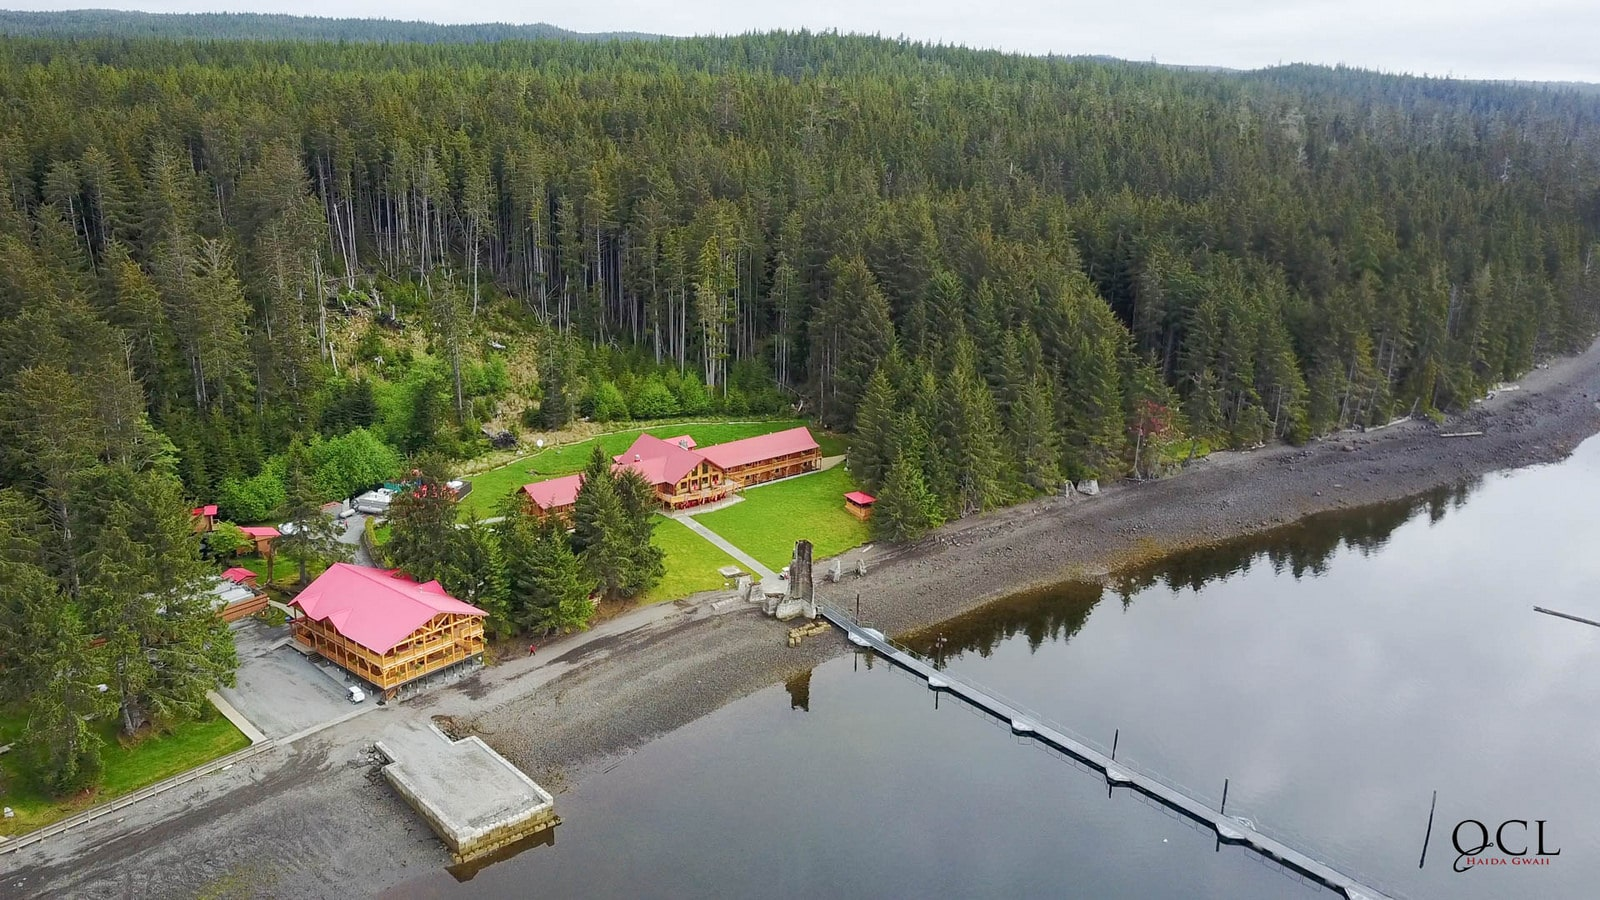 QCL Lodge Aerial Shot